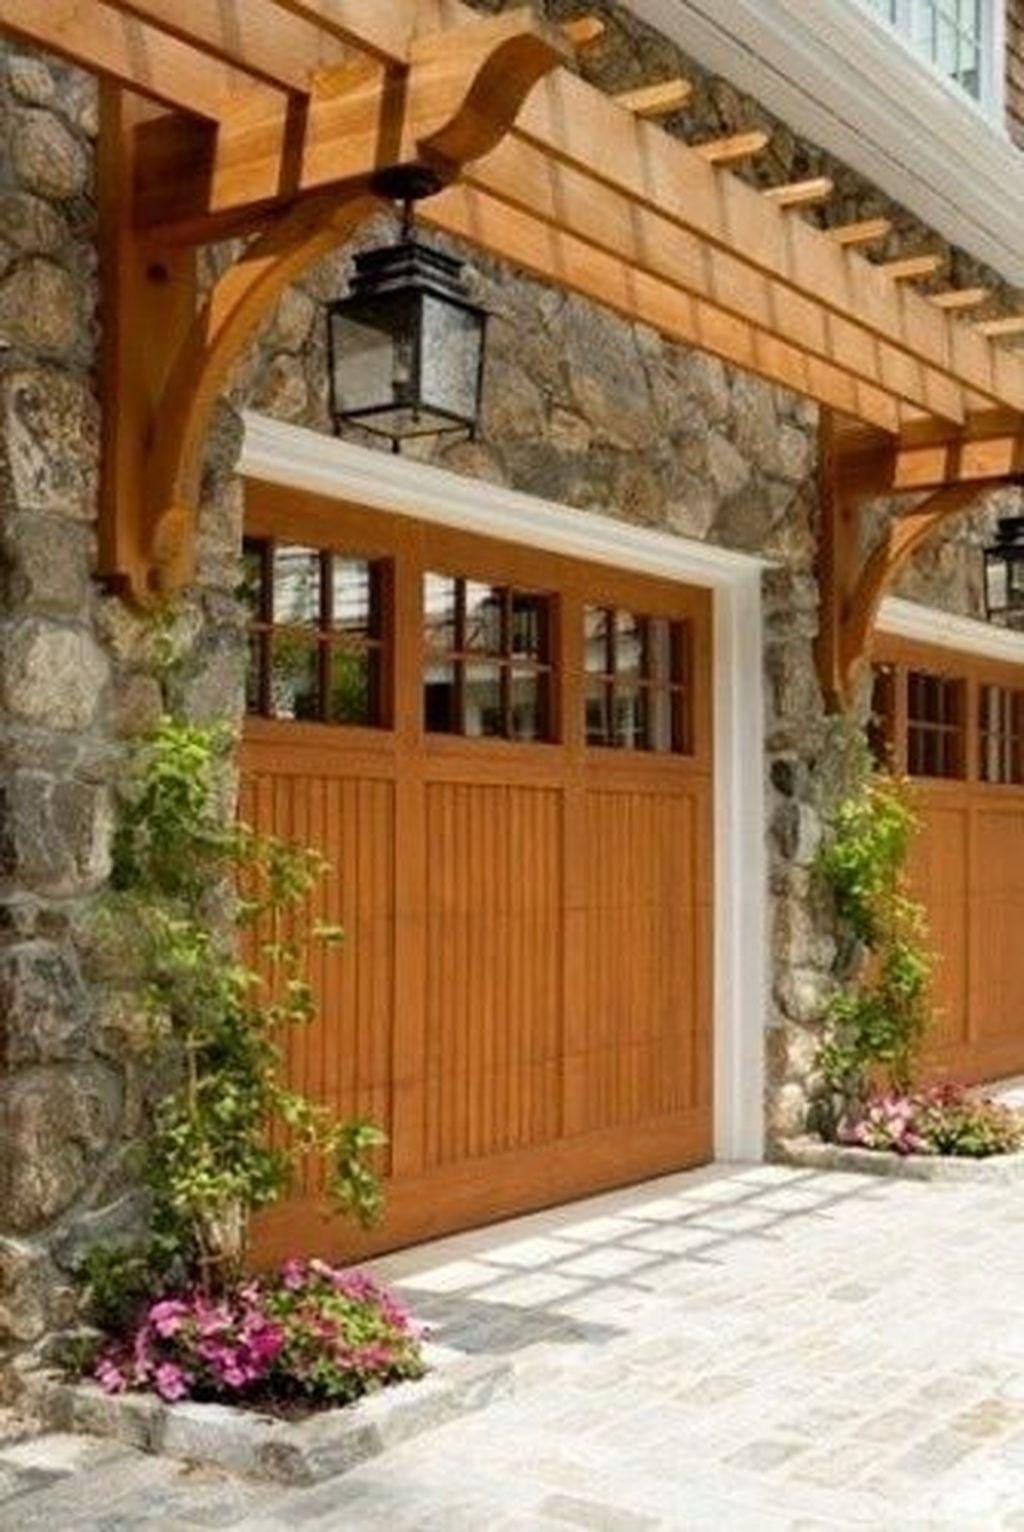 Awesome 40 Mission Style Homes And Doors Inspirations Door Pergola Garage Pergola Pergola